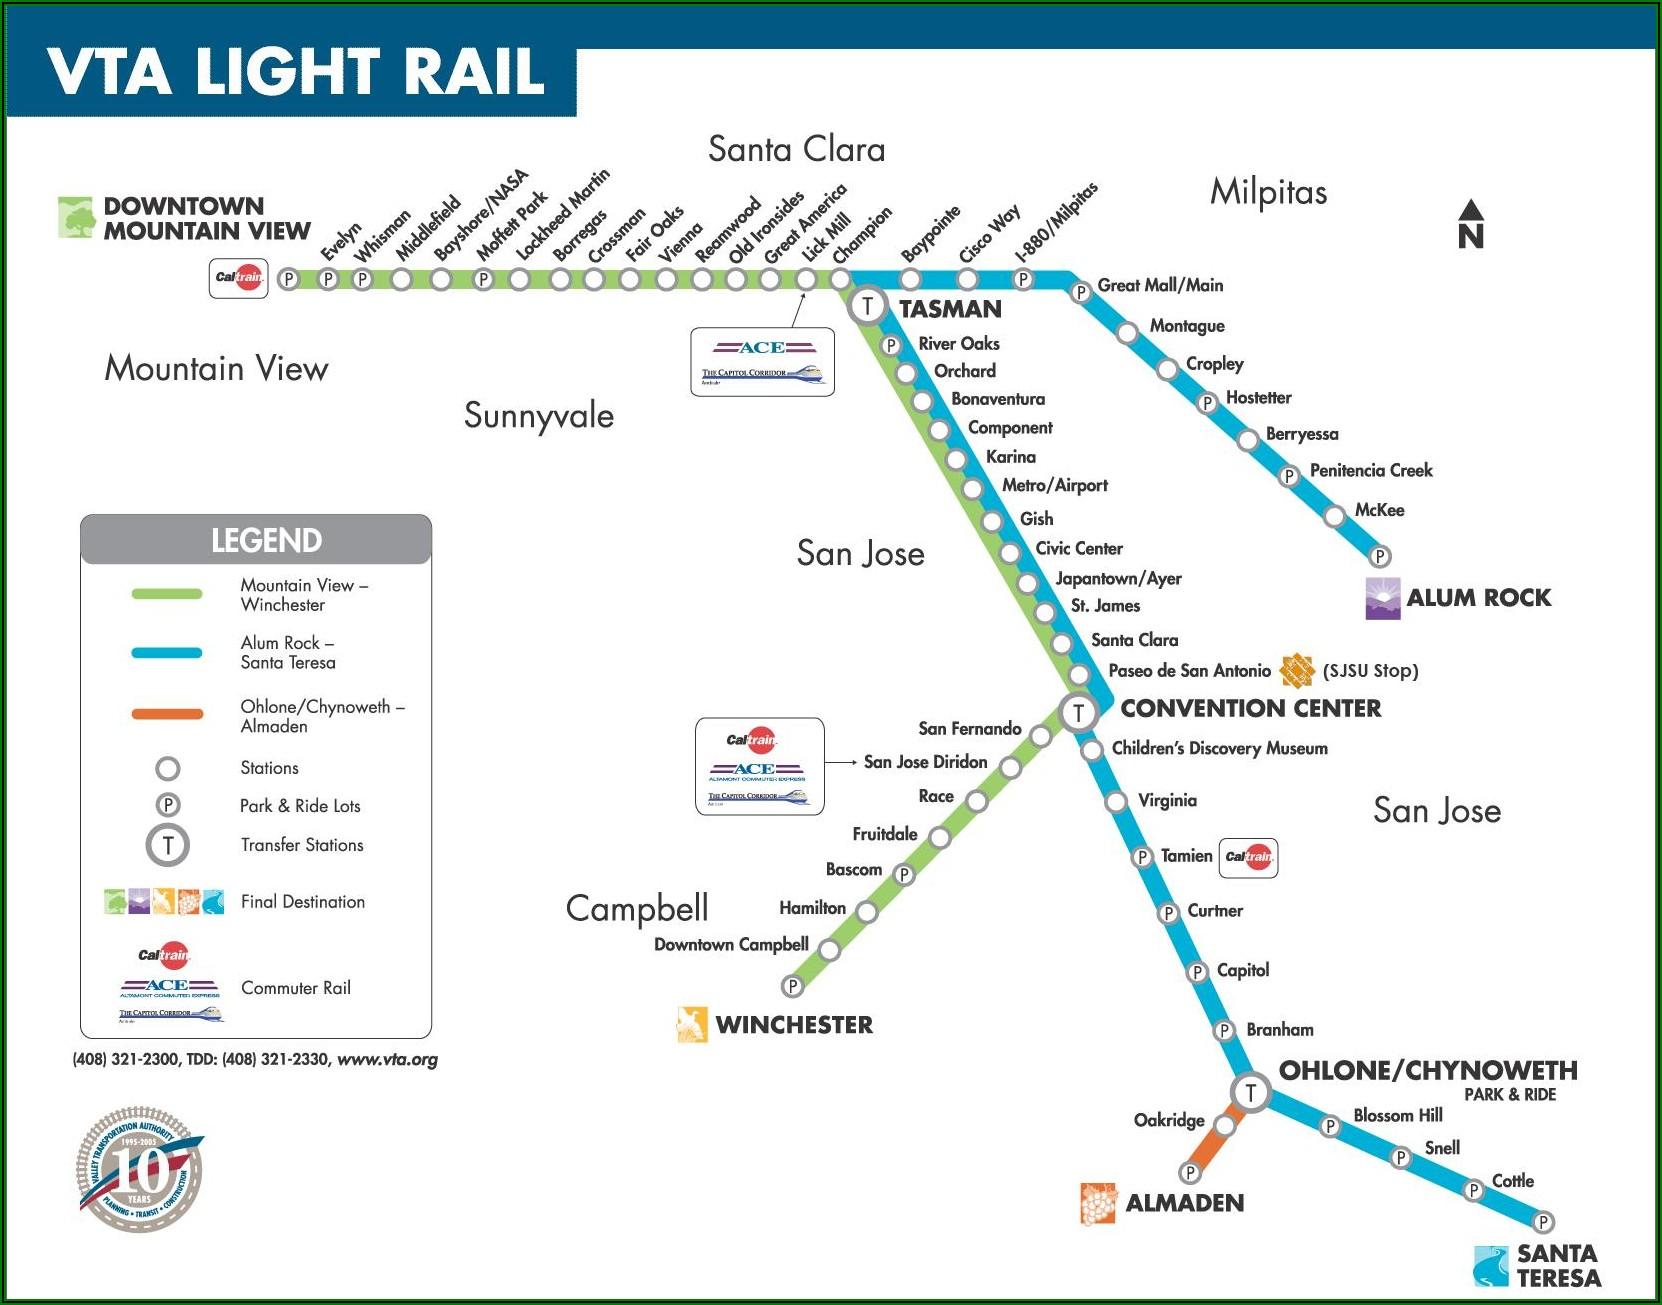 Vta Light Rail Map